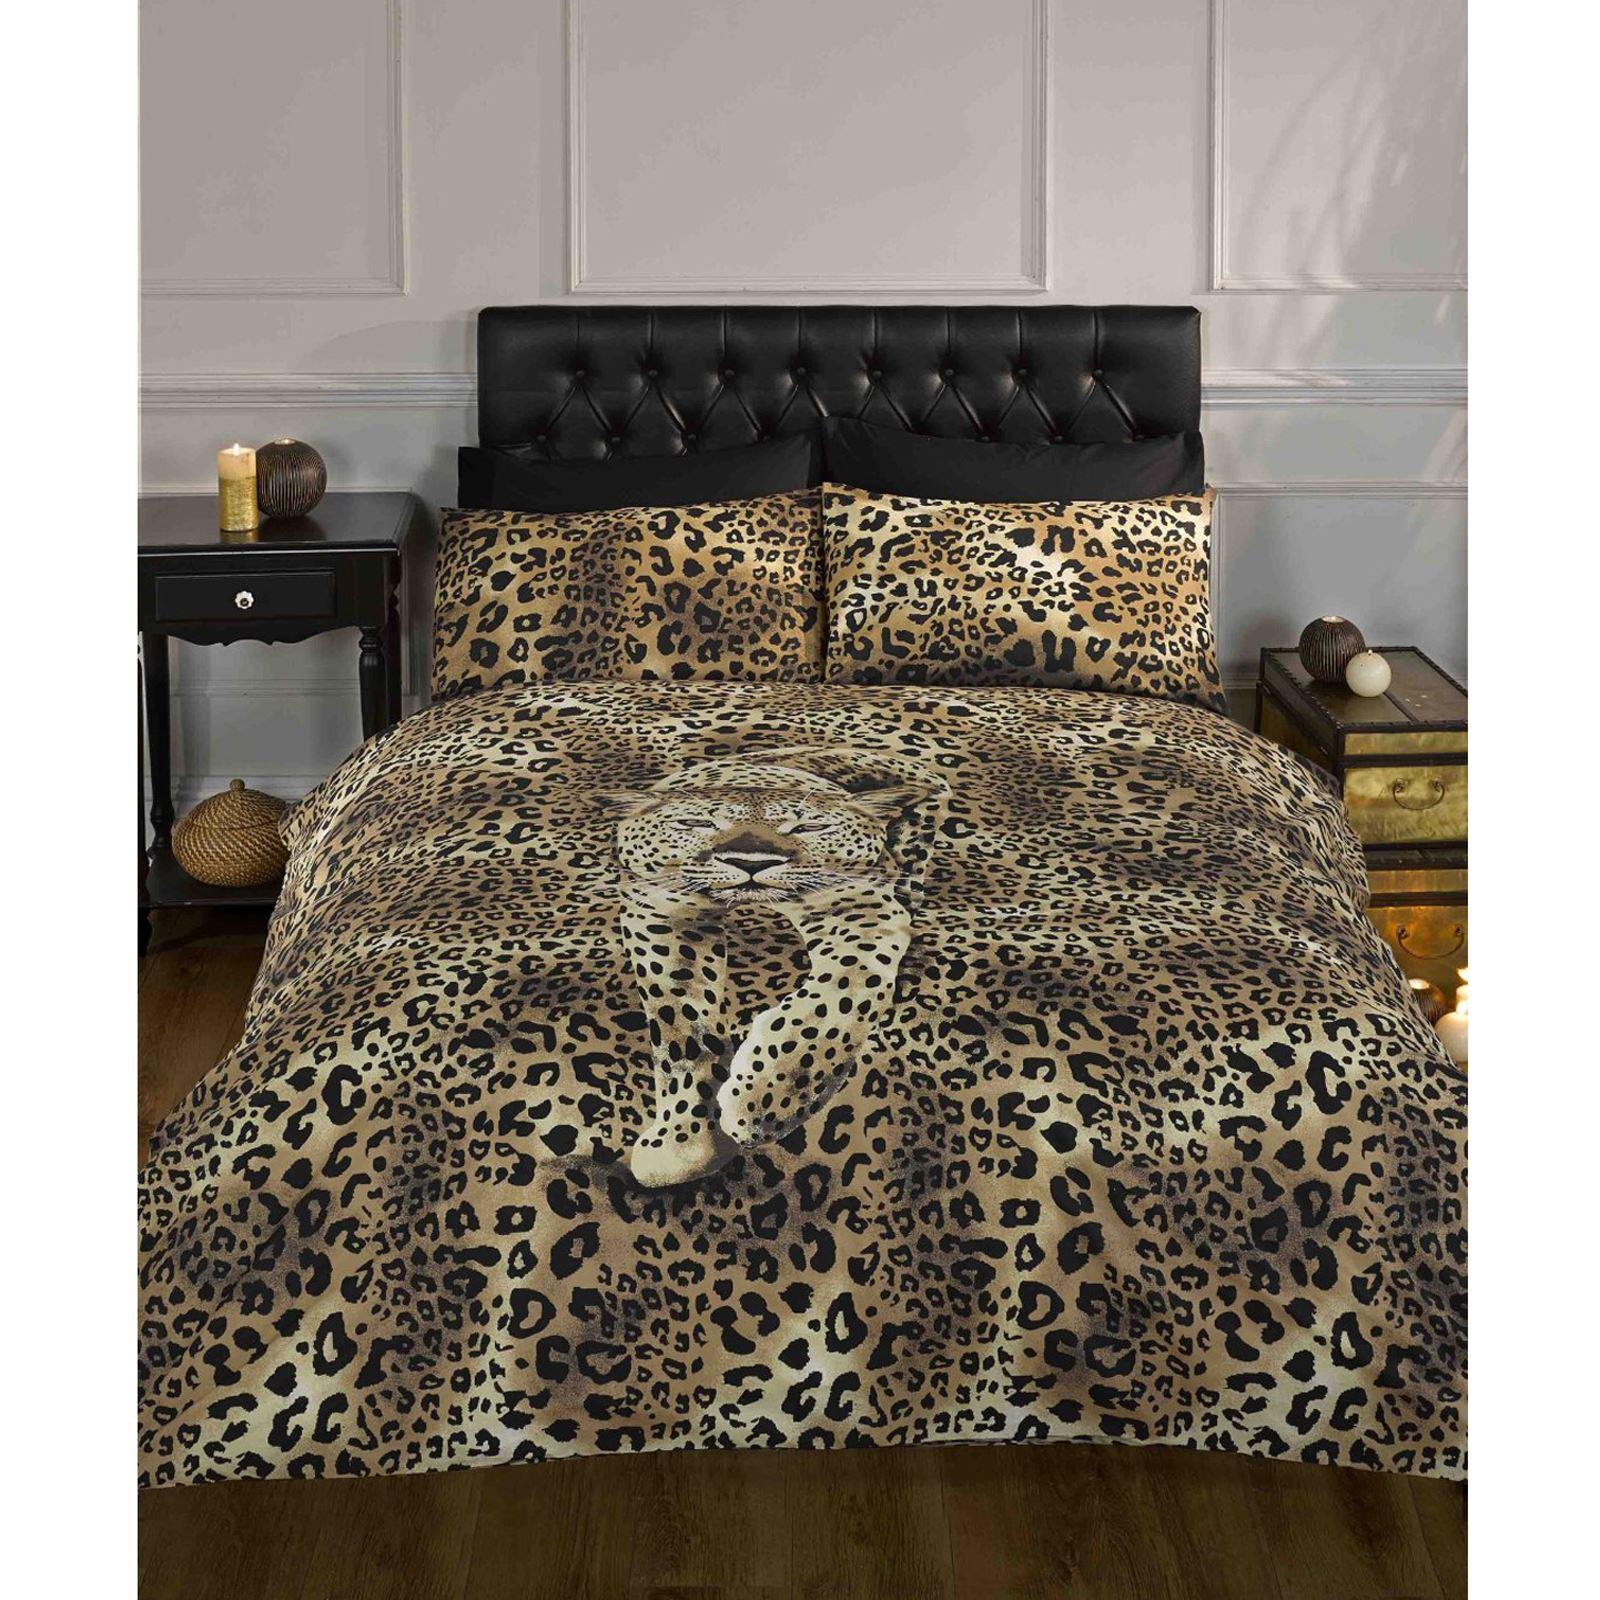 Prowling Leopard Duvet Cover Bedding Set Single Double